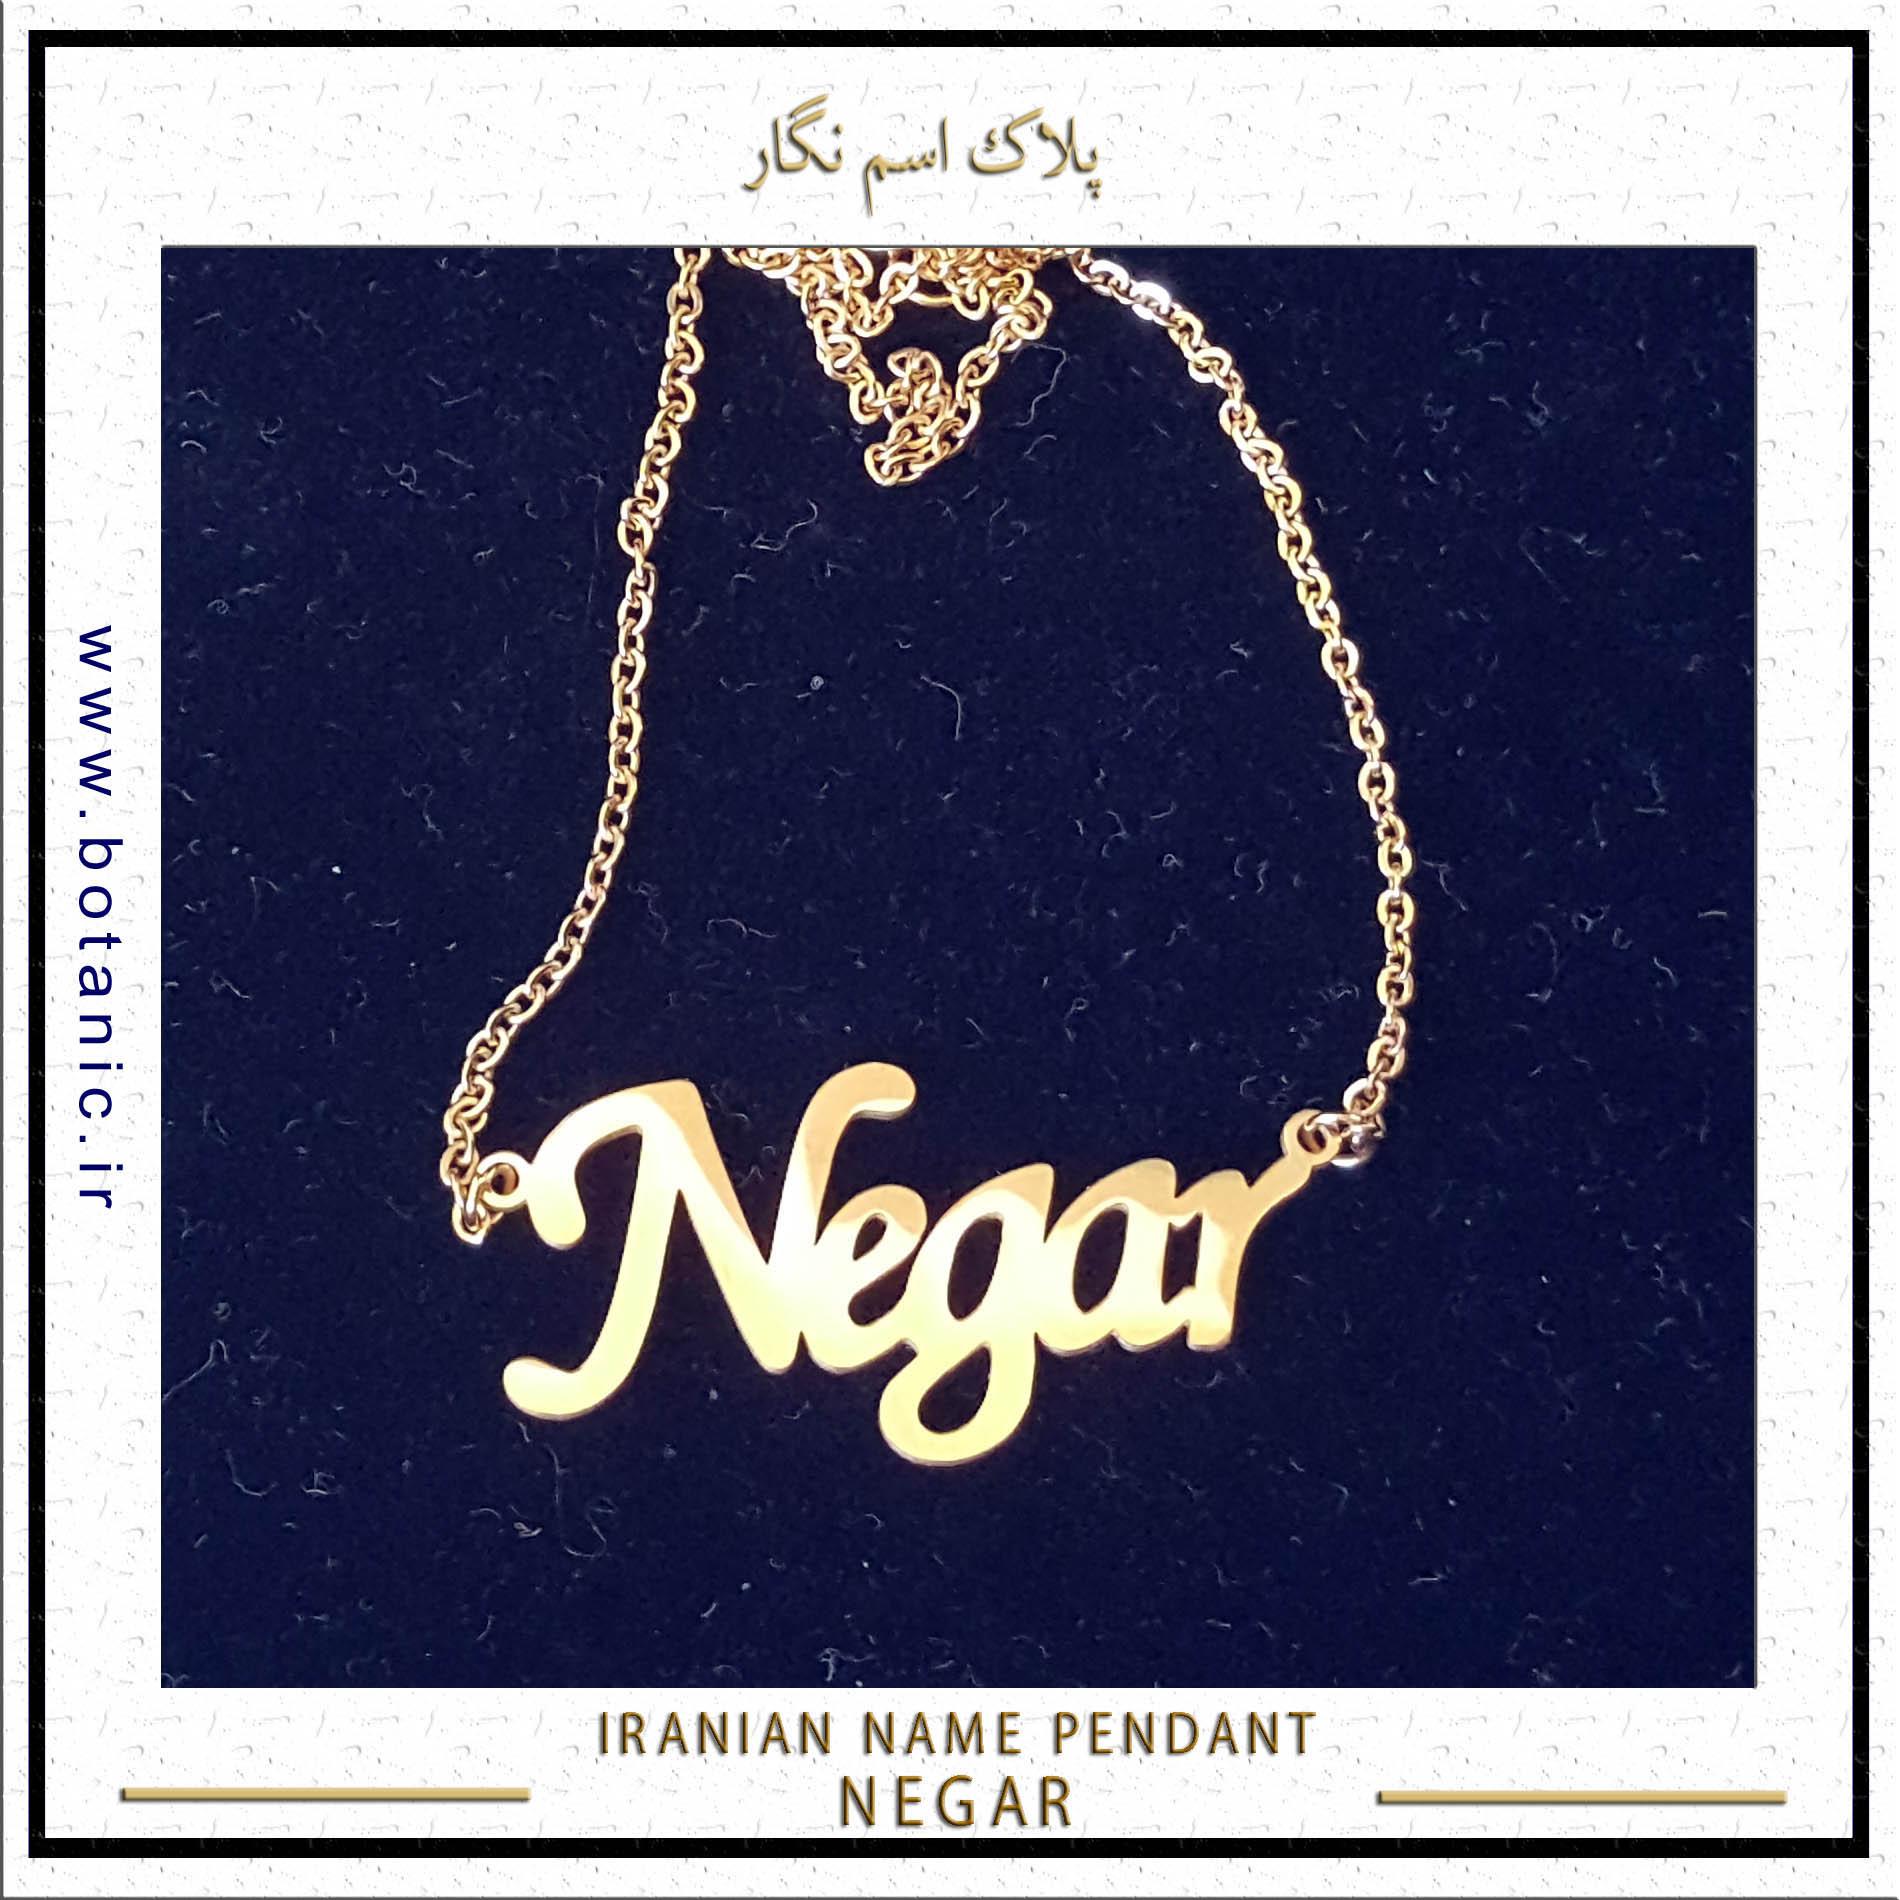 Iranian Name Pendant Negar